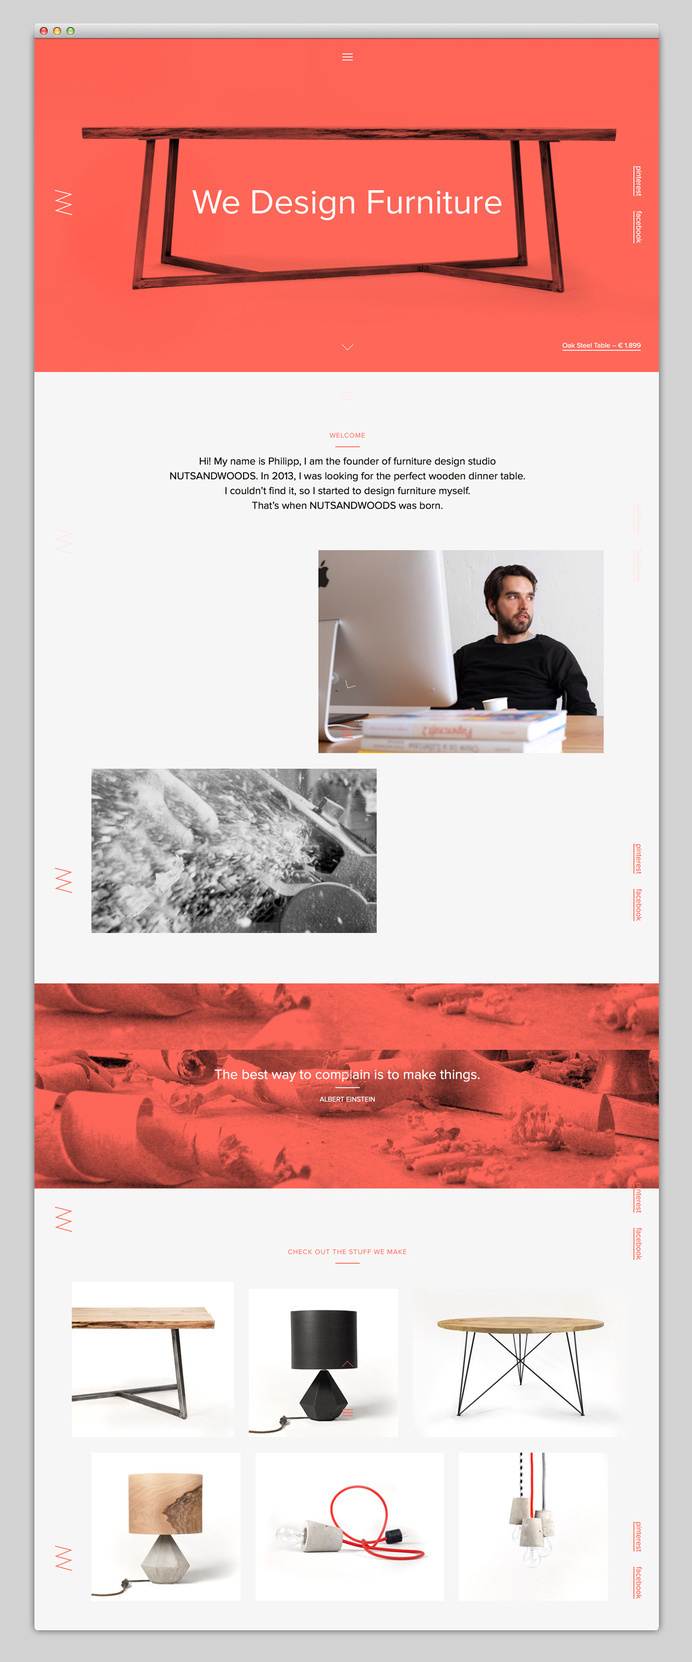 Websites We Love — Showcasing The Best in Web Design #agency #design #best #website #ui #furniture #wood #minimal #webdesign #web #typography